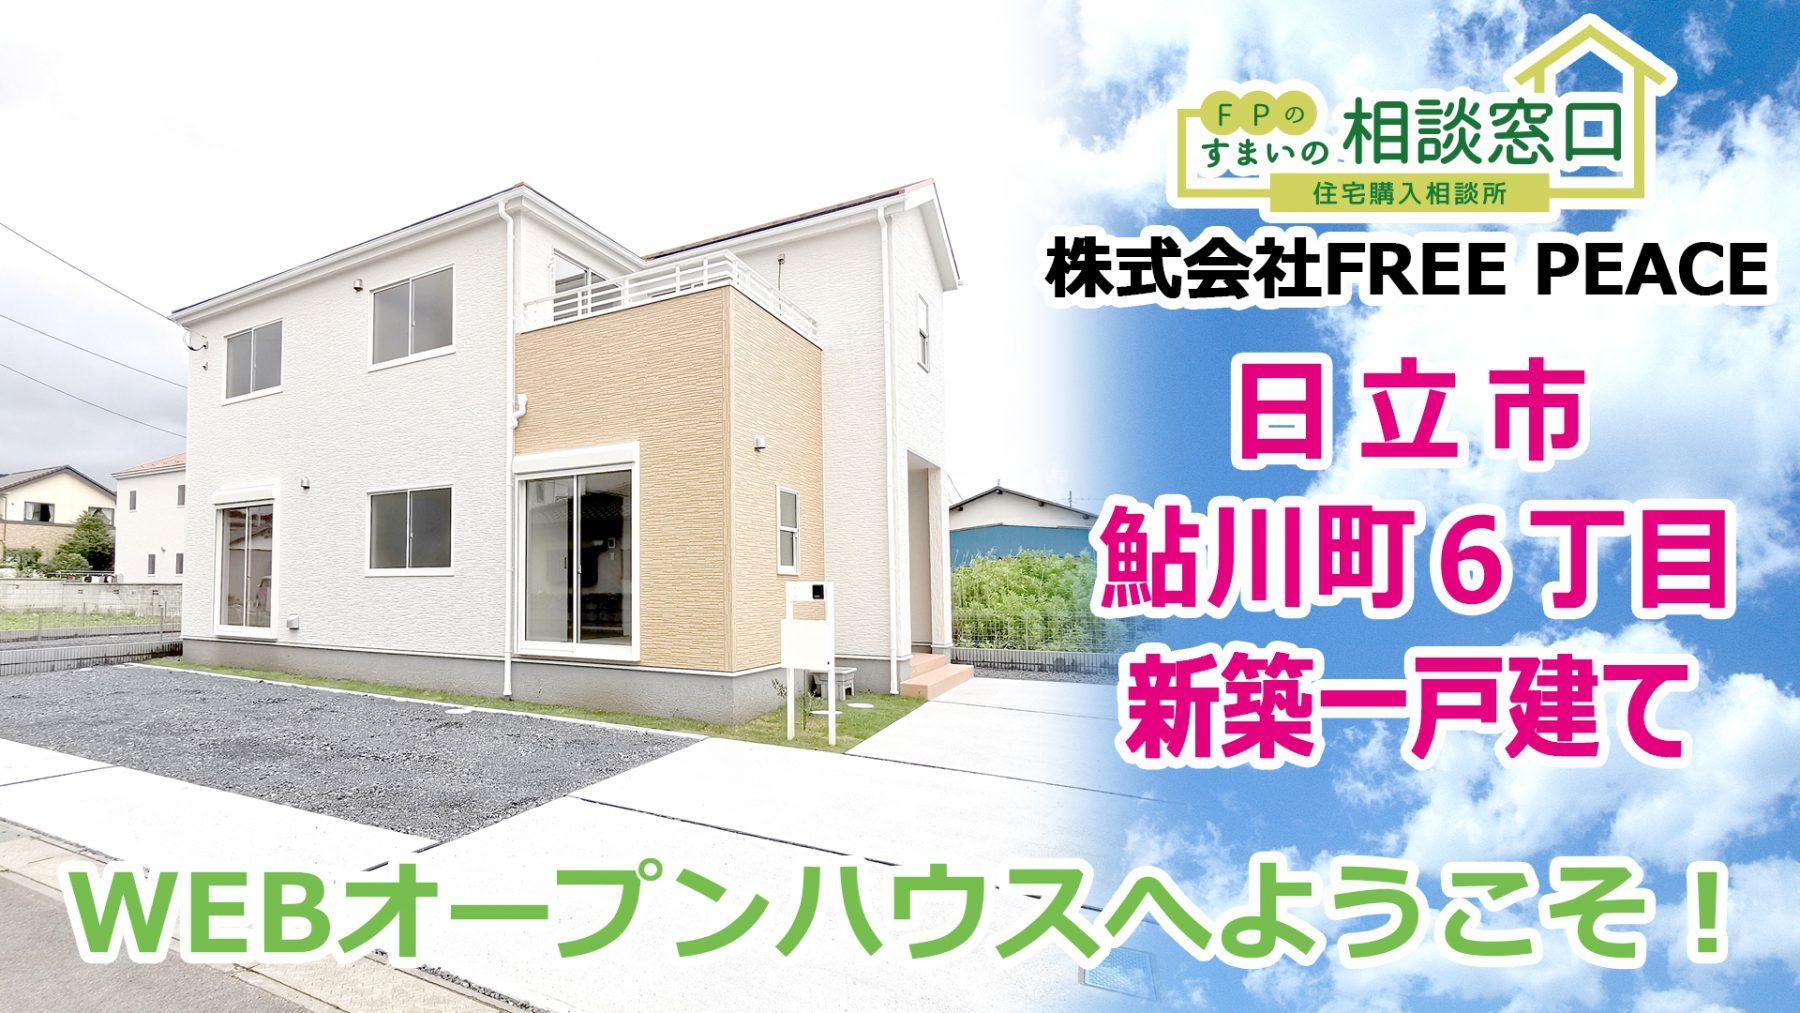 WEBオープンハウス♪日立市鮎川町新築一戸建てです。